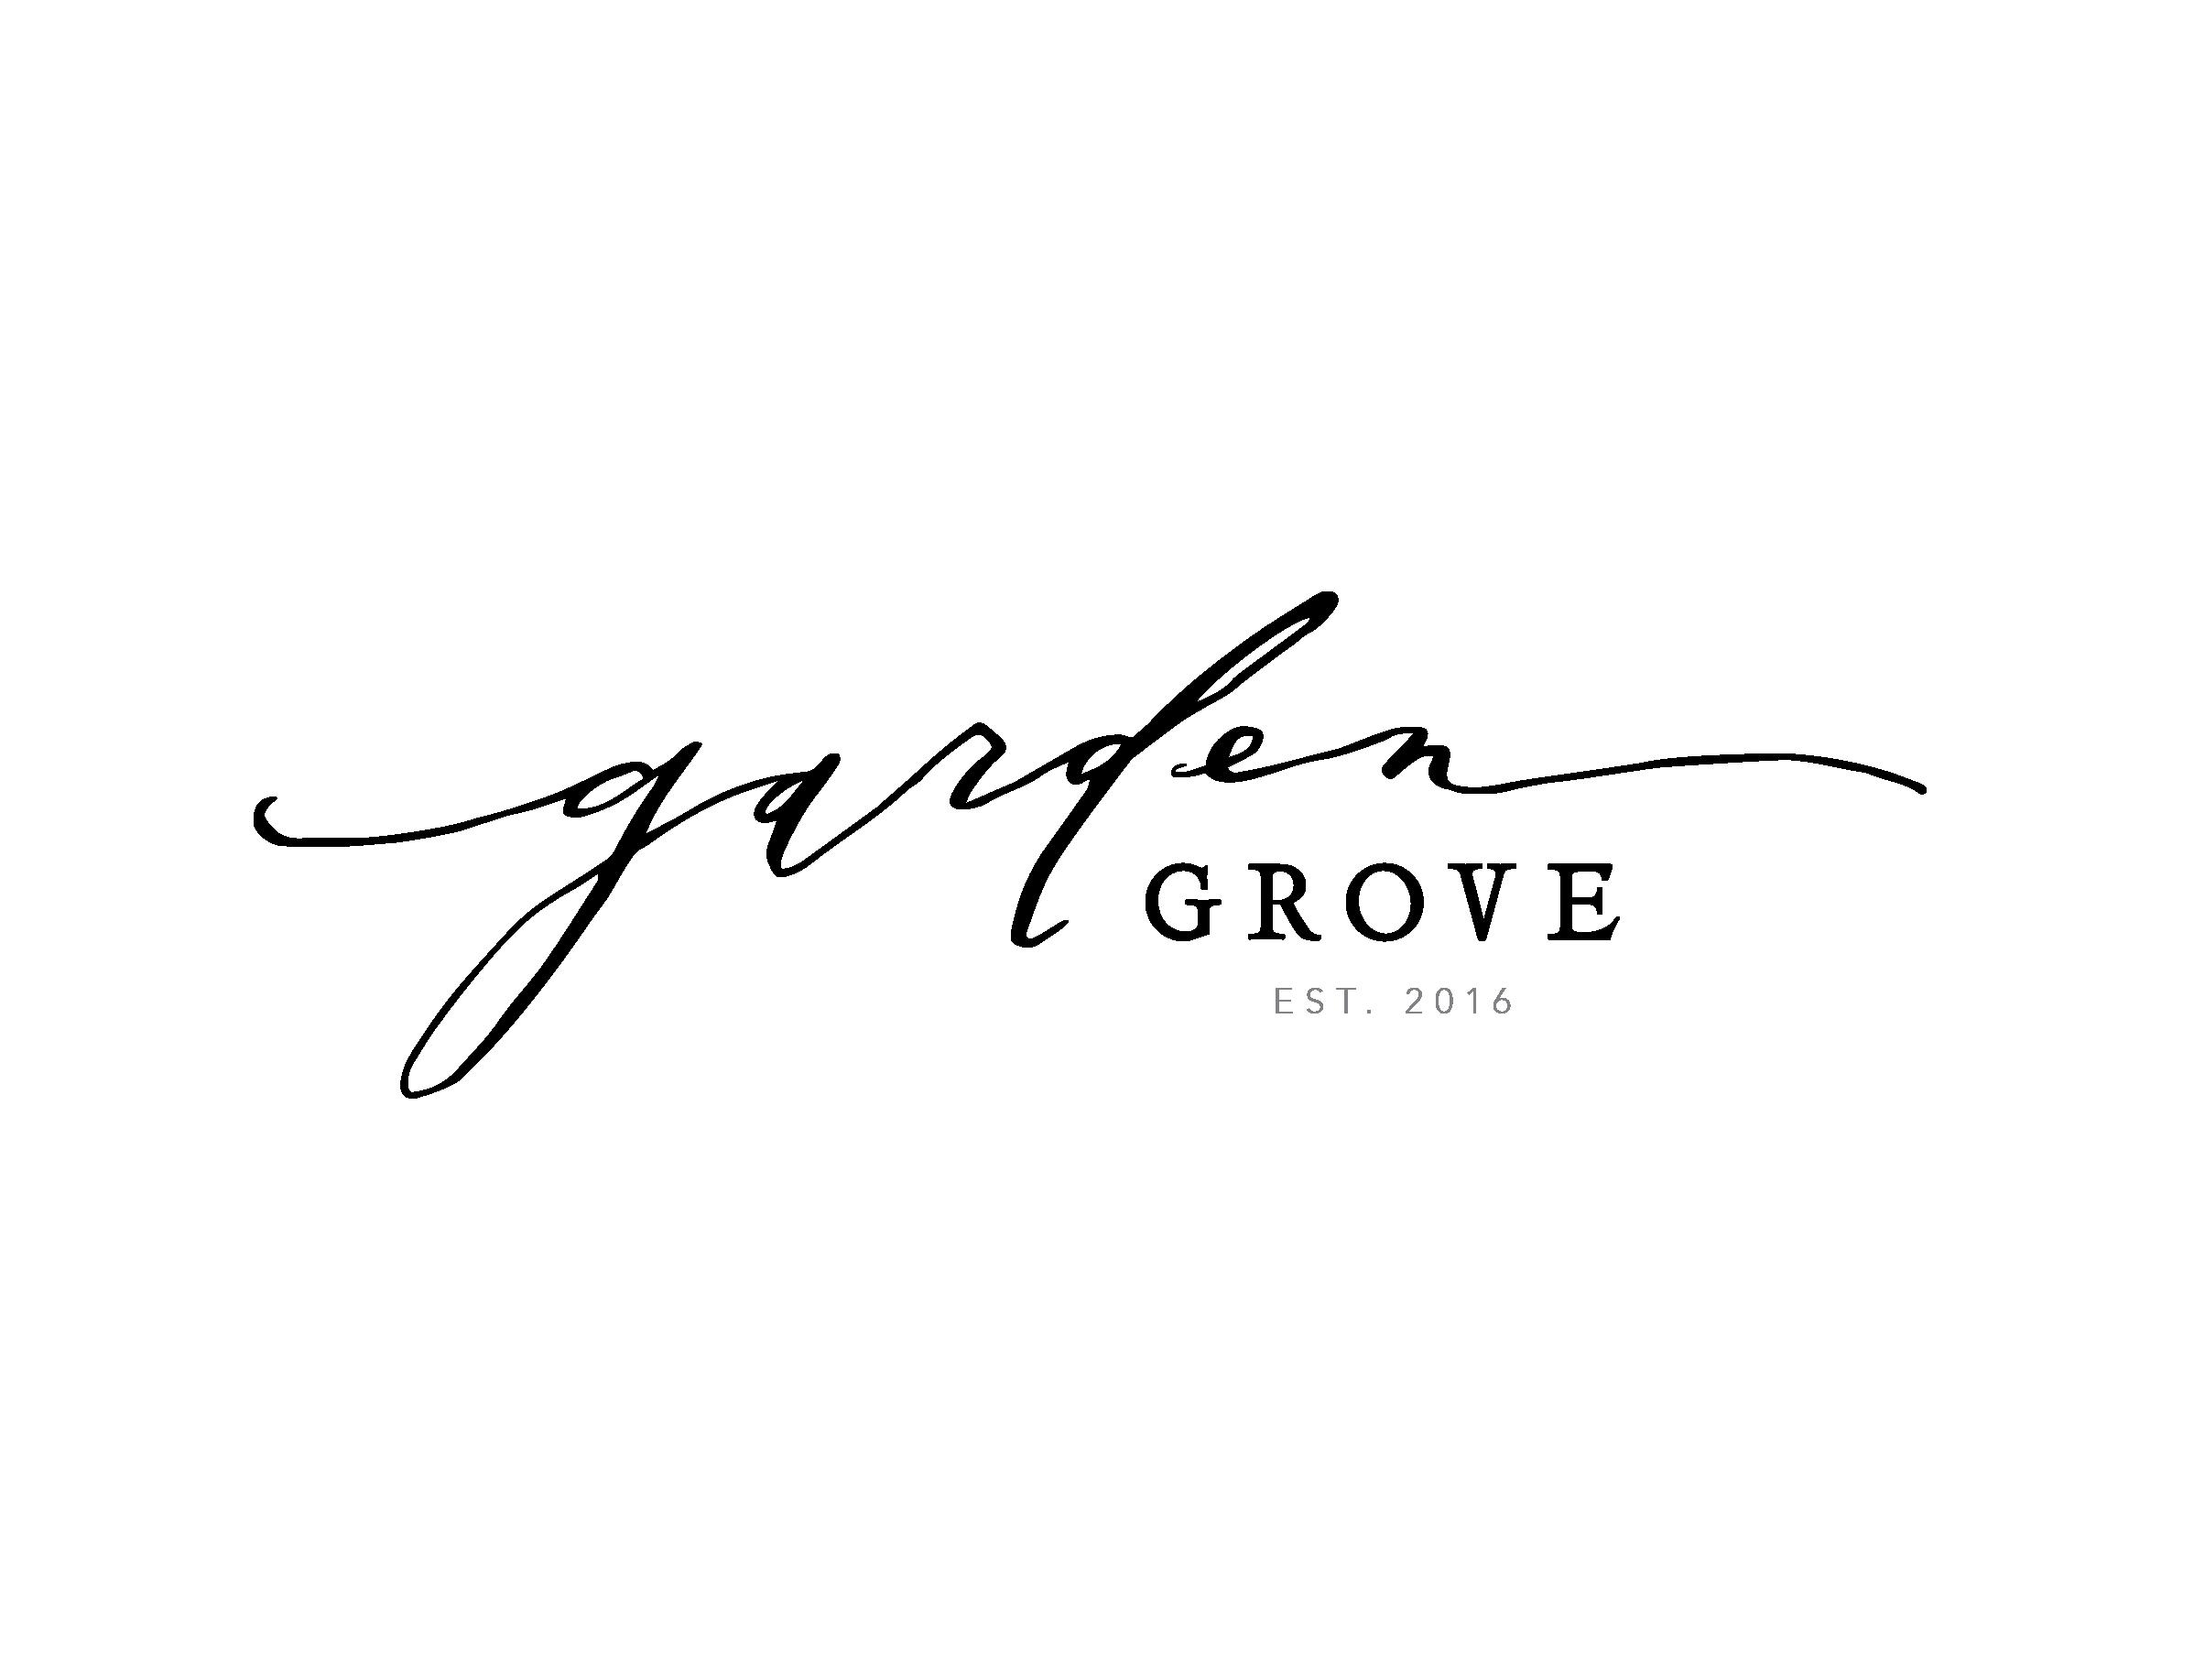 Garden Grove Identity